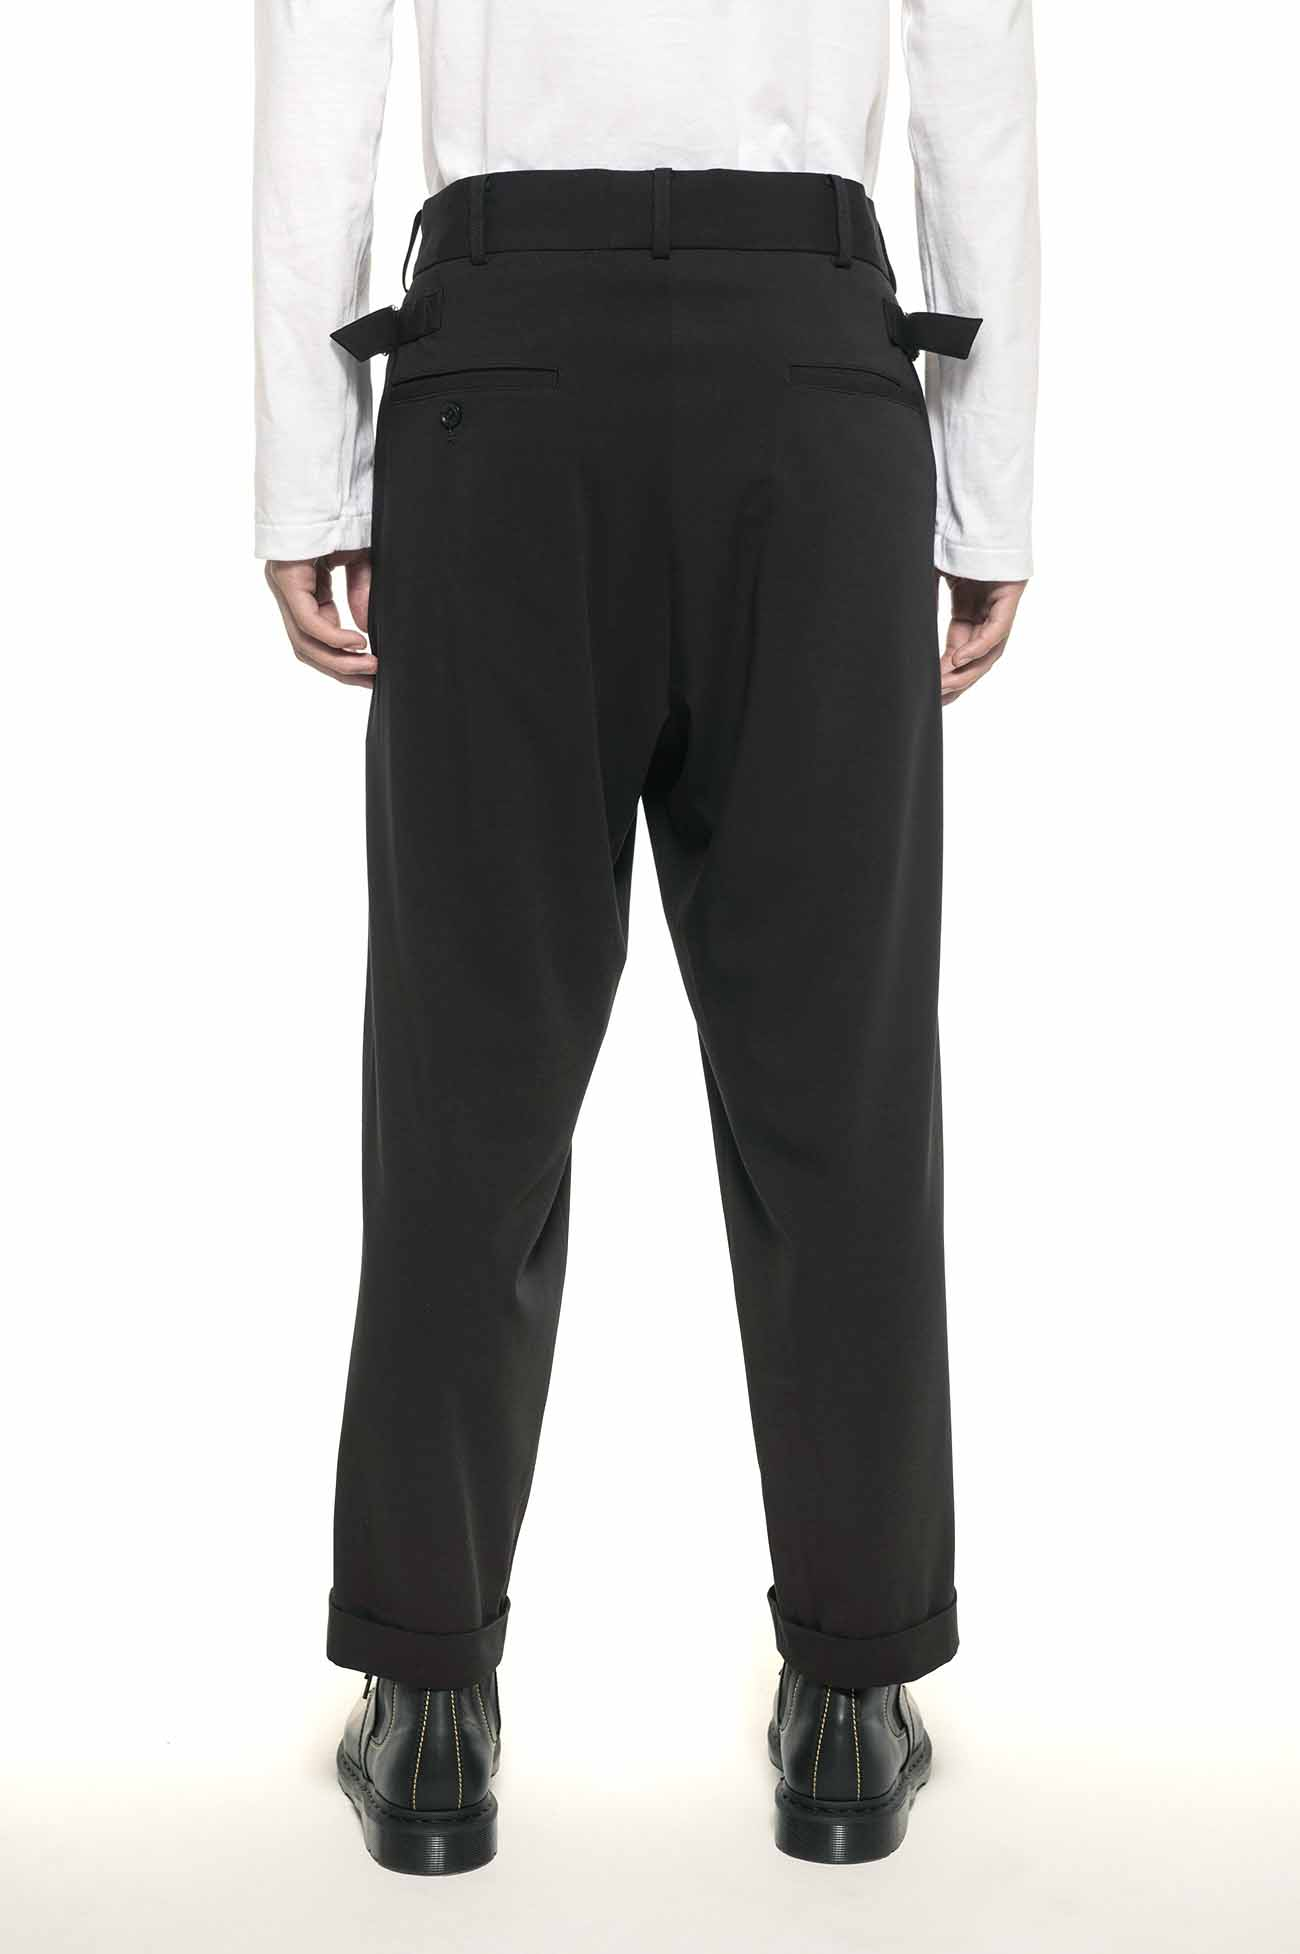 Pe/Rayon Gabardine Stretch Tapered Waist Adjustment McKin Pants